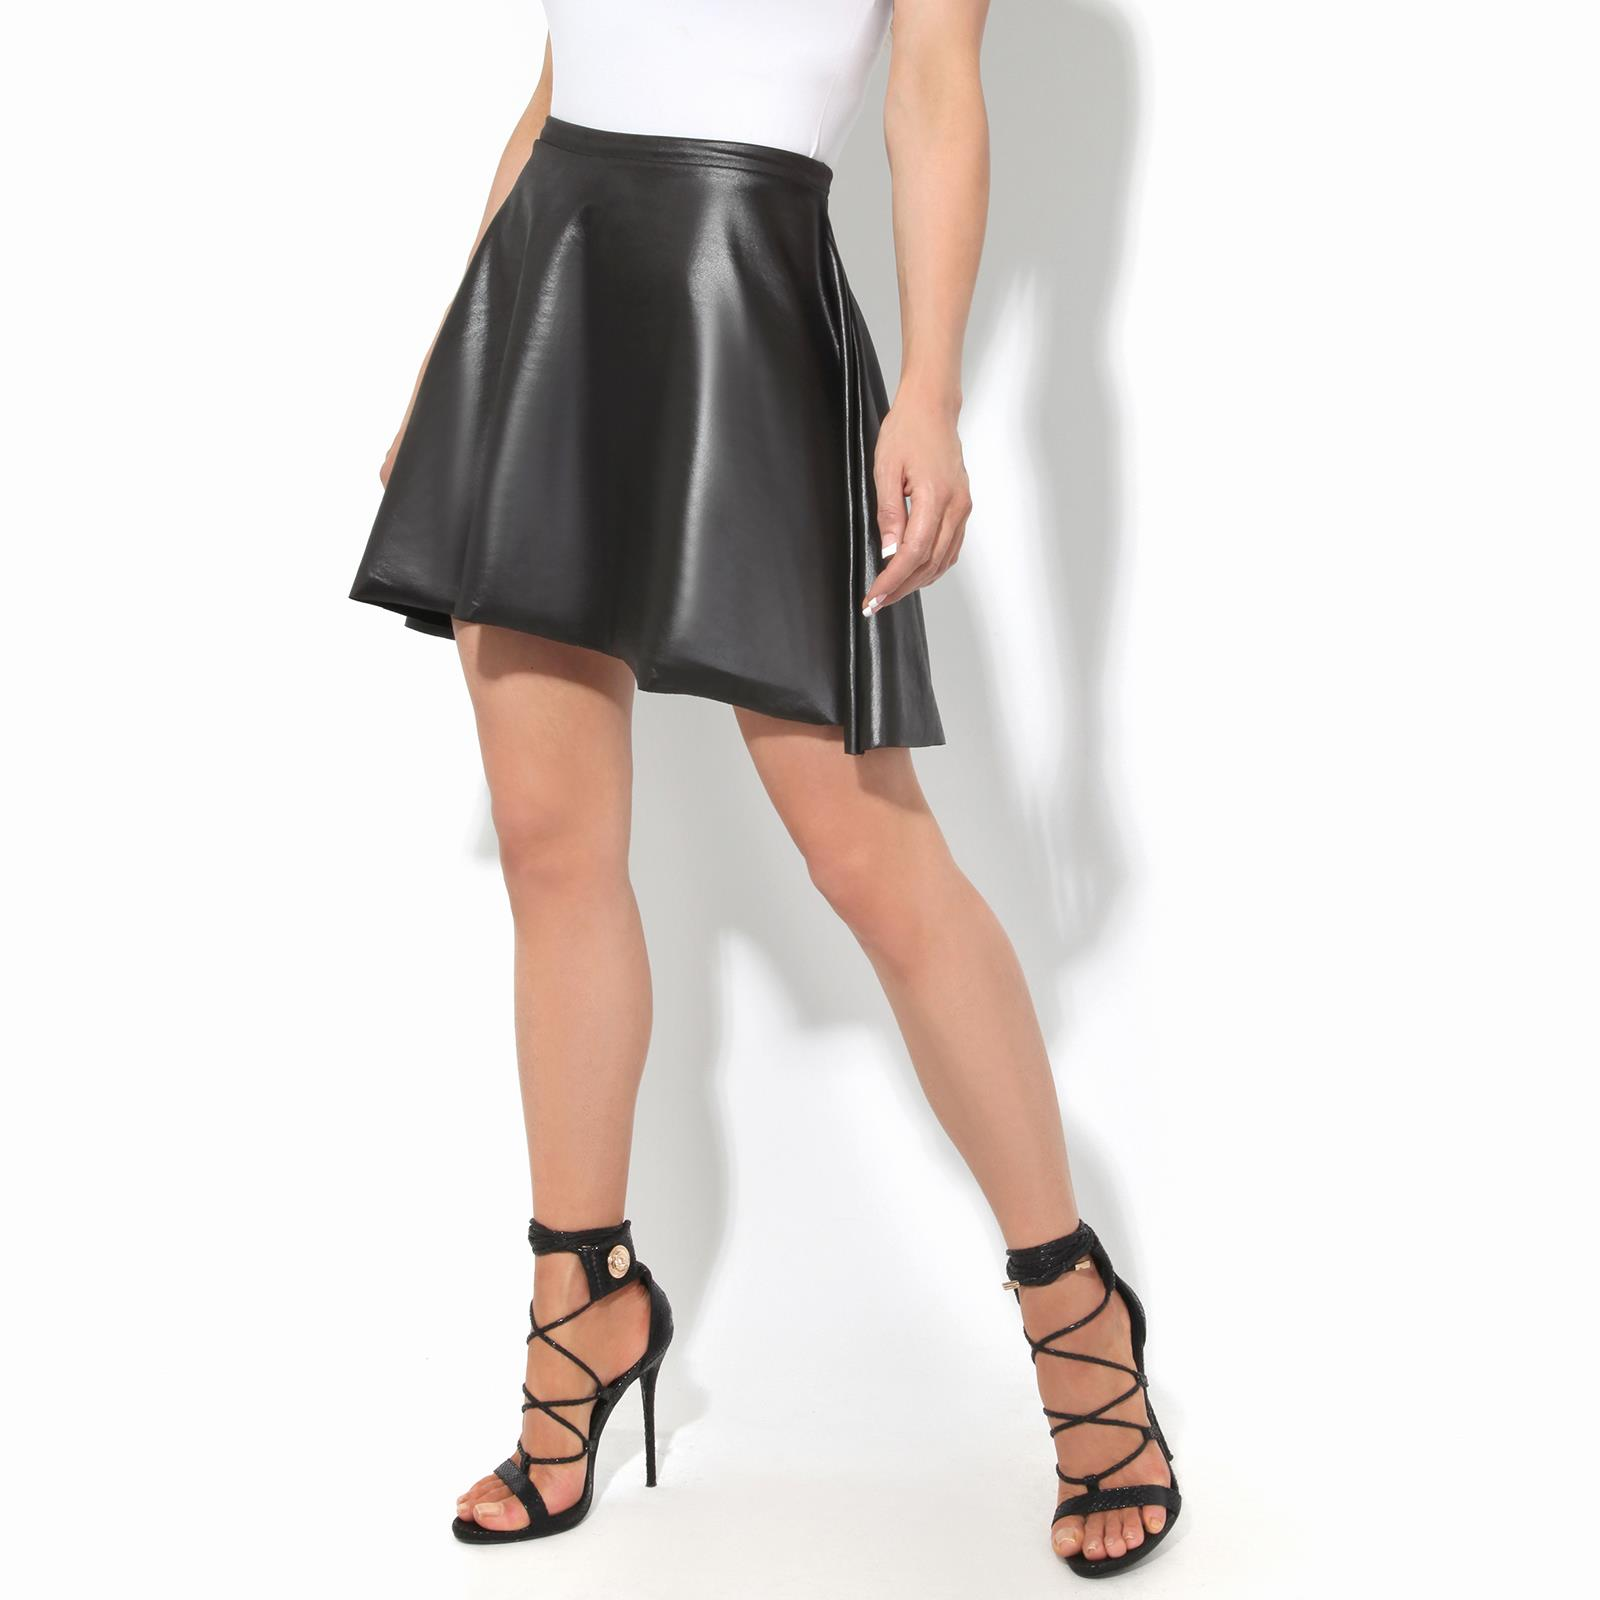 Damen Hohe Taille Minirock PVC Leder A Line Swing Ausgestellt Voll Plissee Party